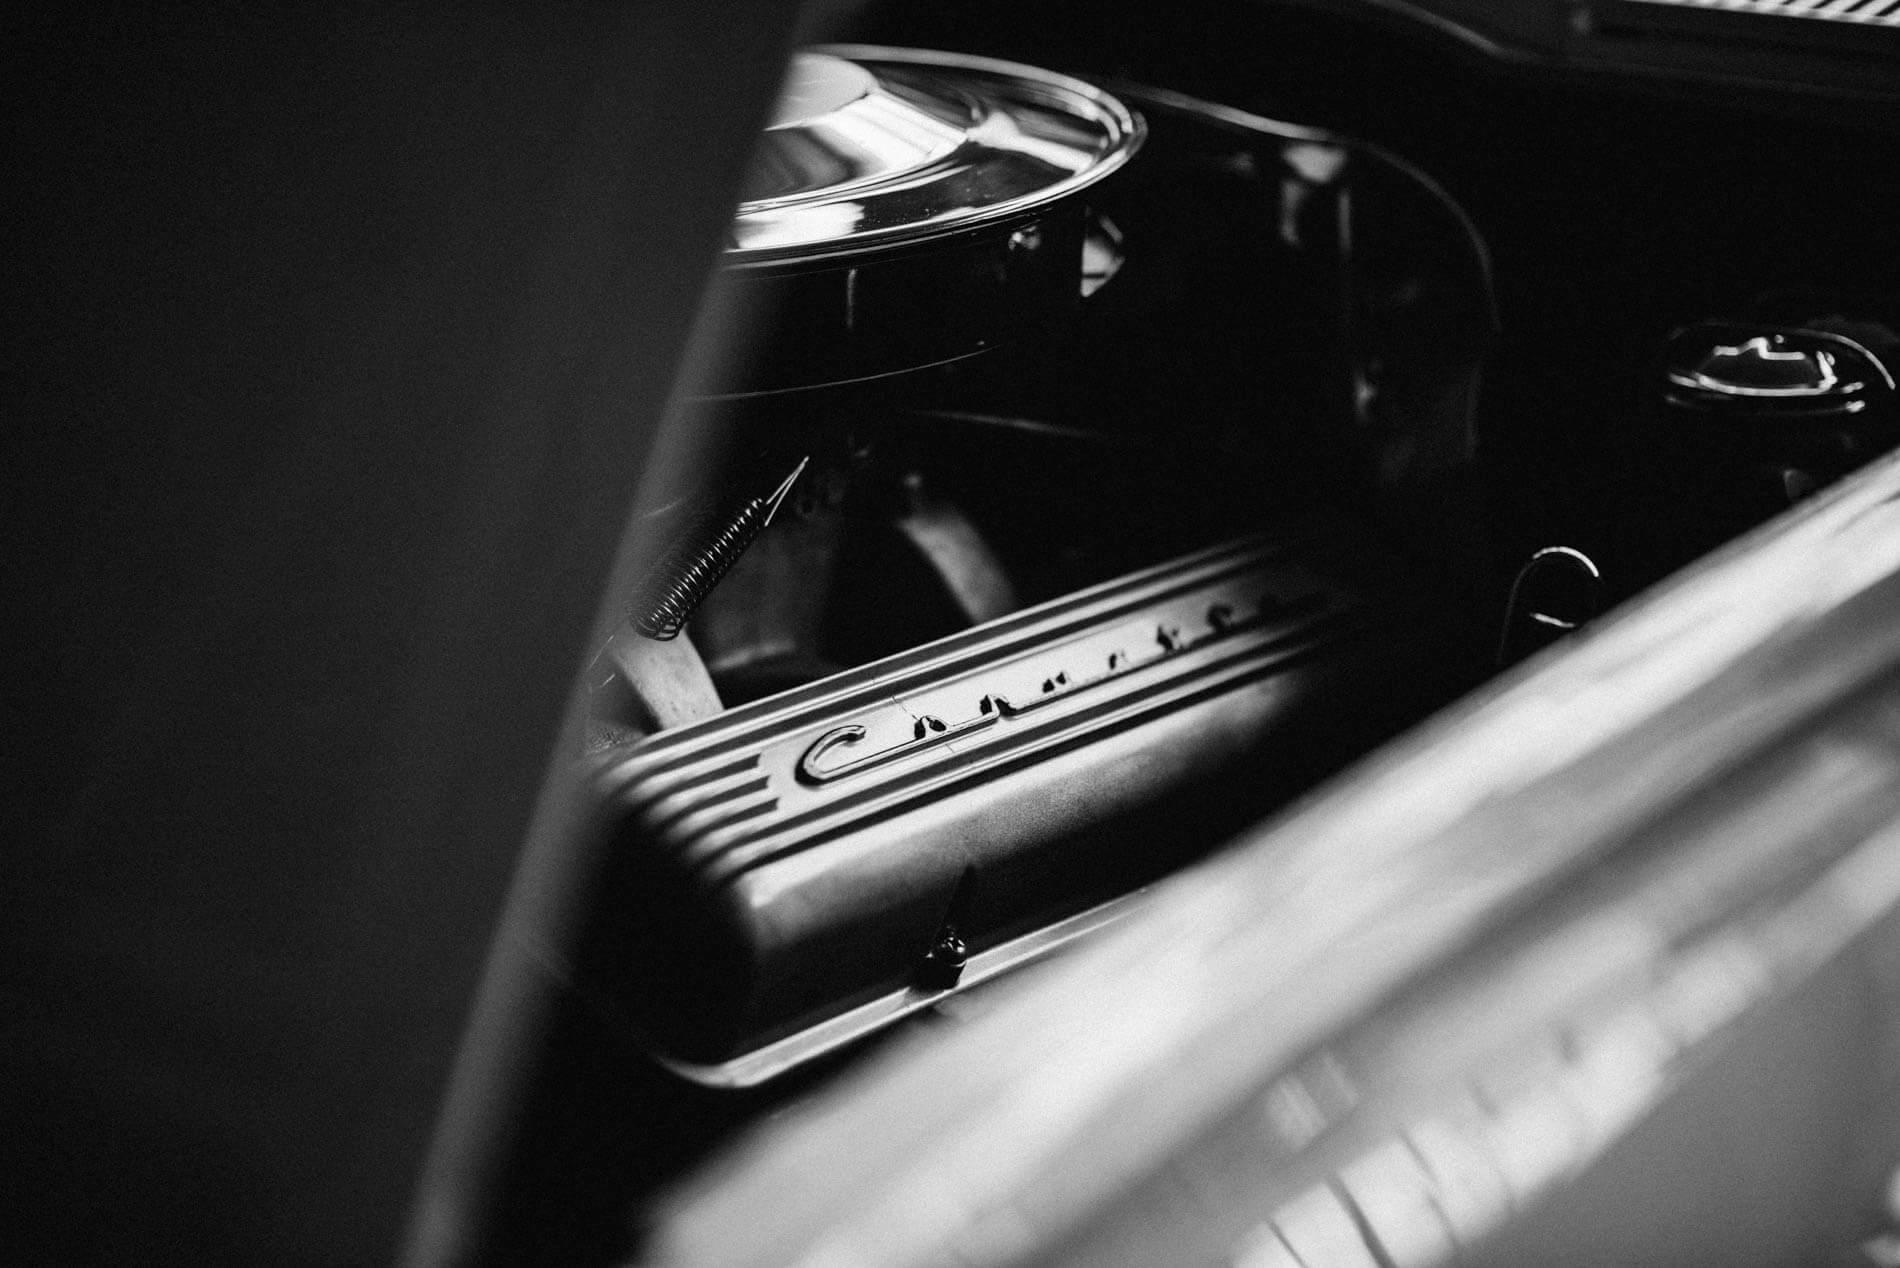 US Car Classics sascha hoecker kramm newsletter us cars classic 6